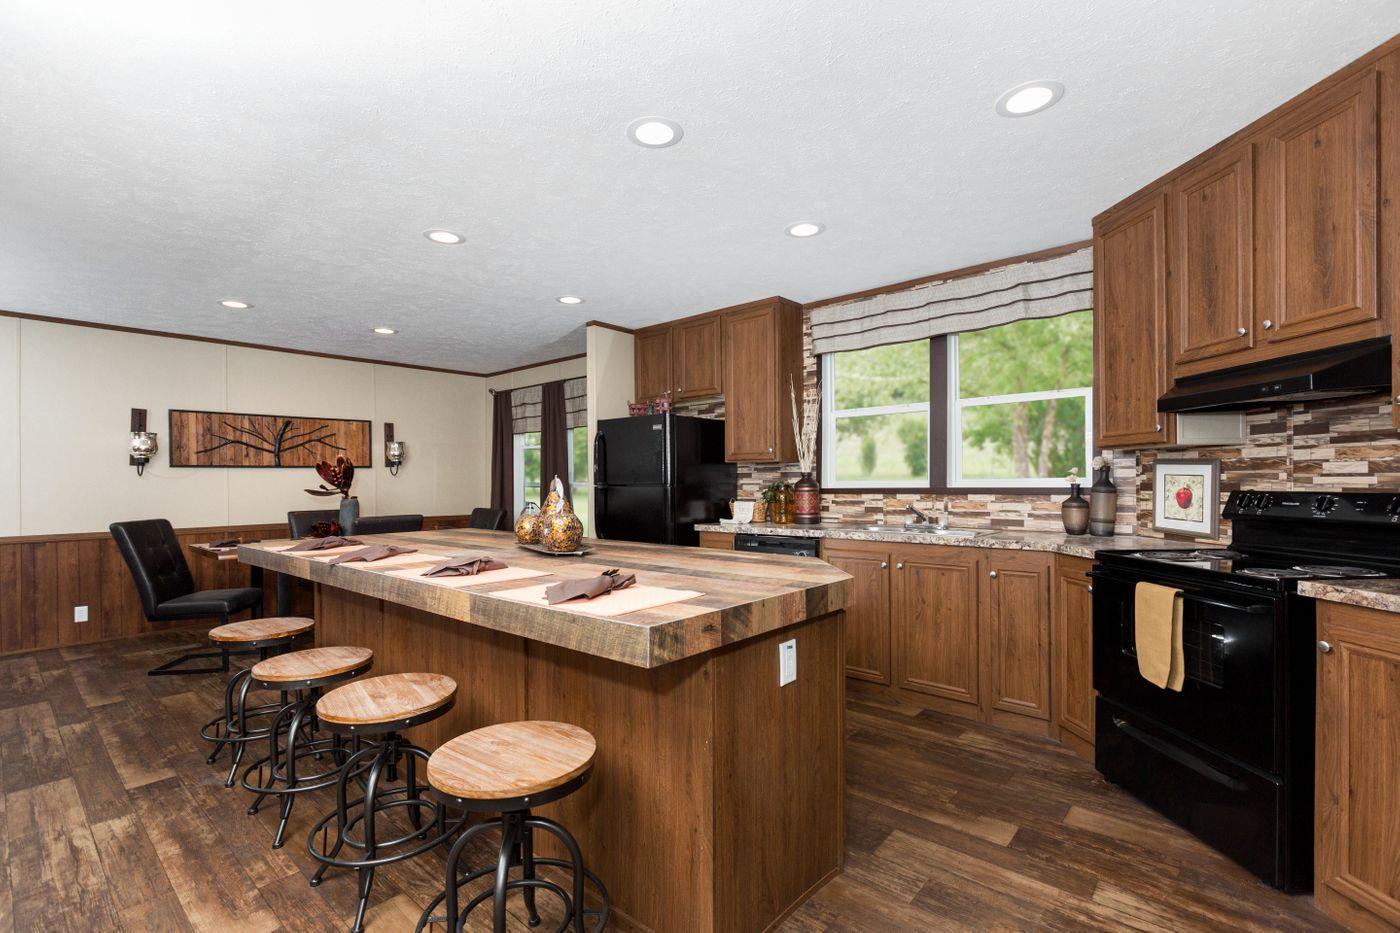 The Bayside Kitchen